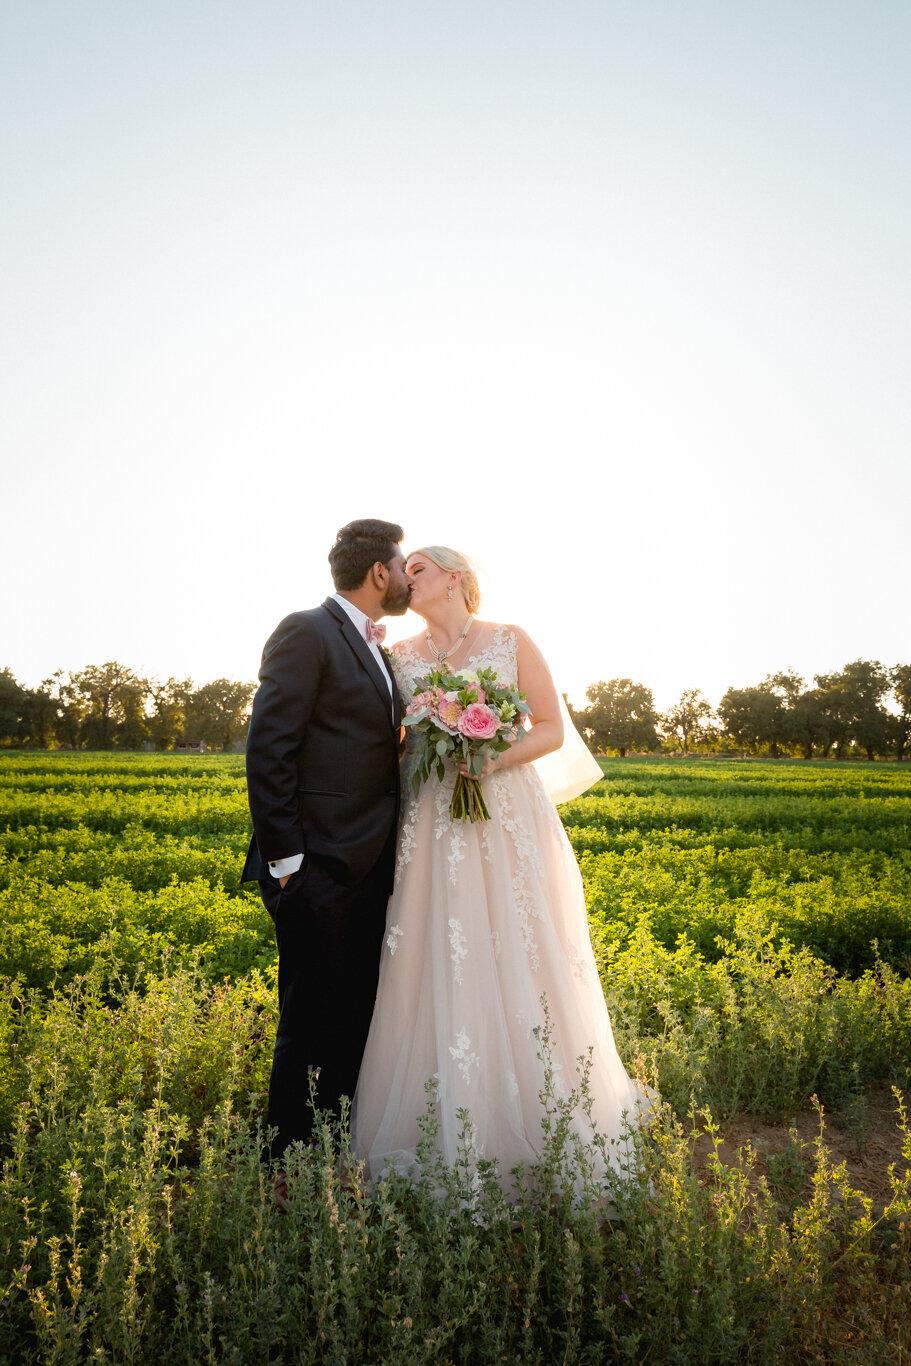 2019.08.24_Emily-Ashir-Wedding-at-the-Maples-6214.jpg